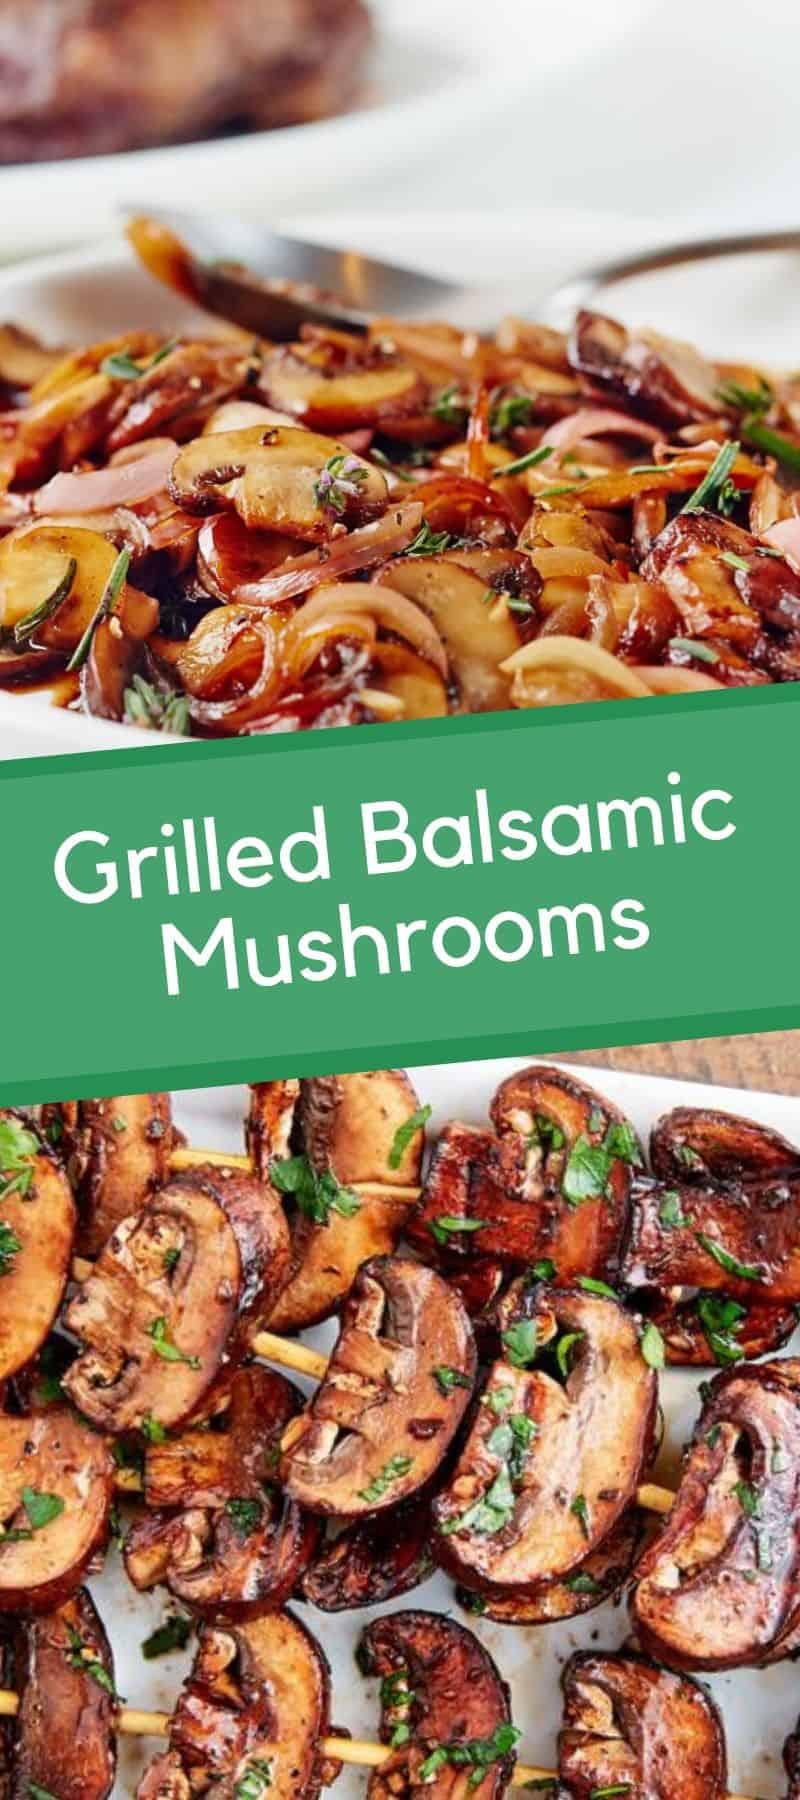 Grilled Balsamic Mushrooms Recipe